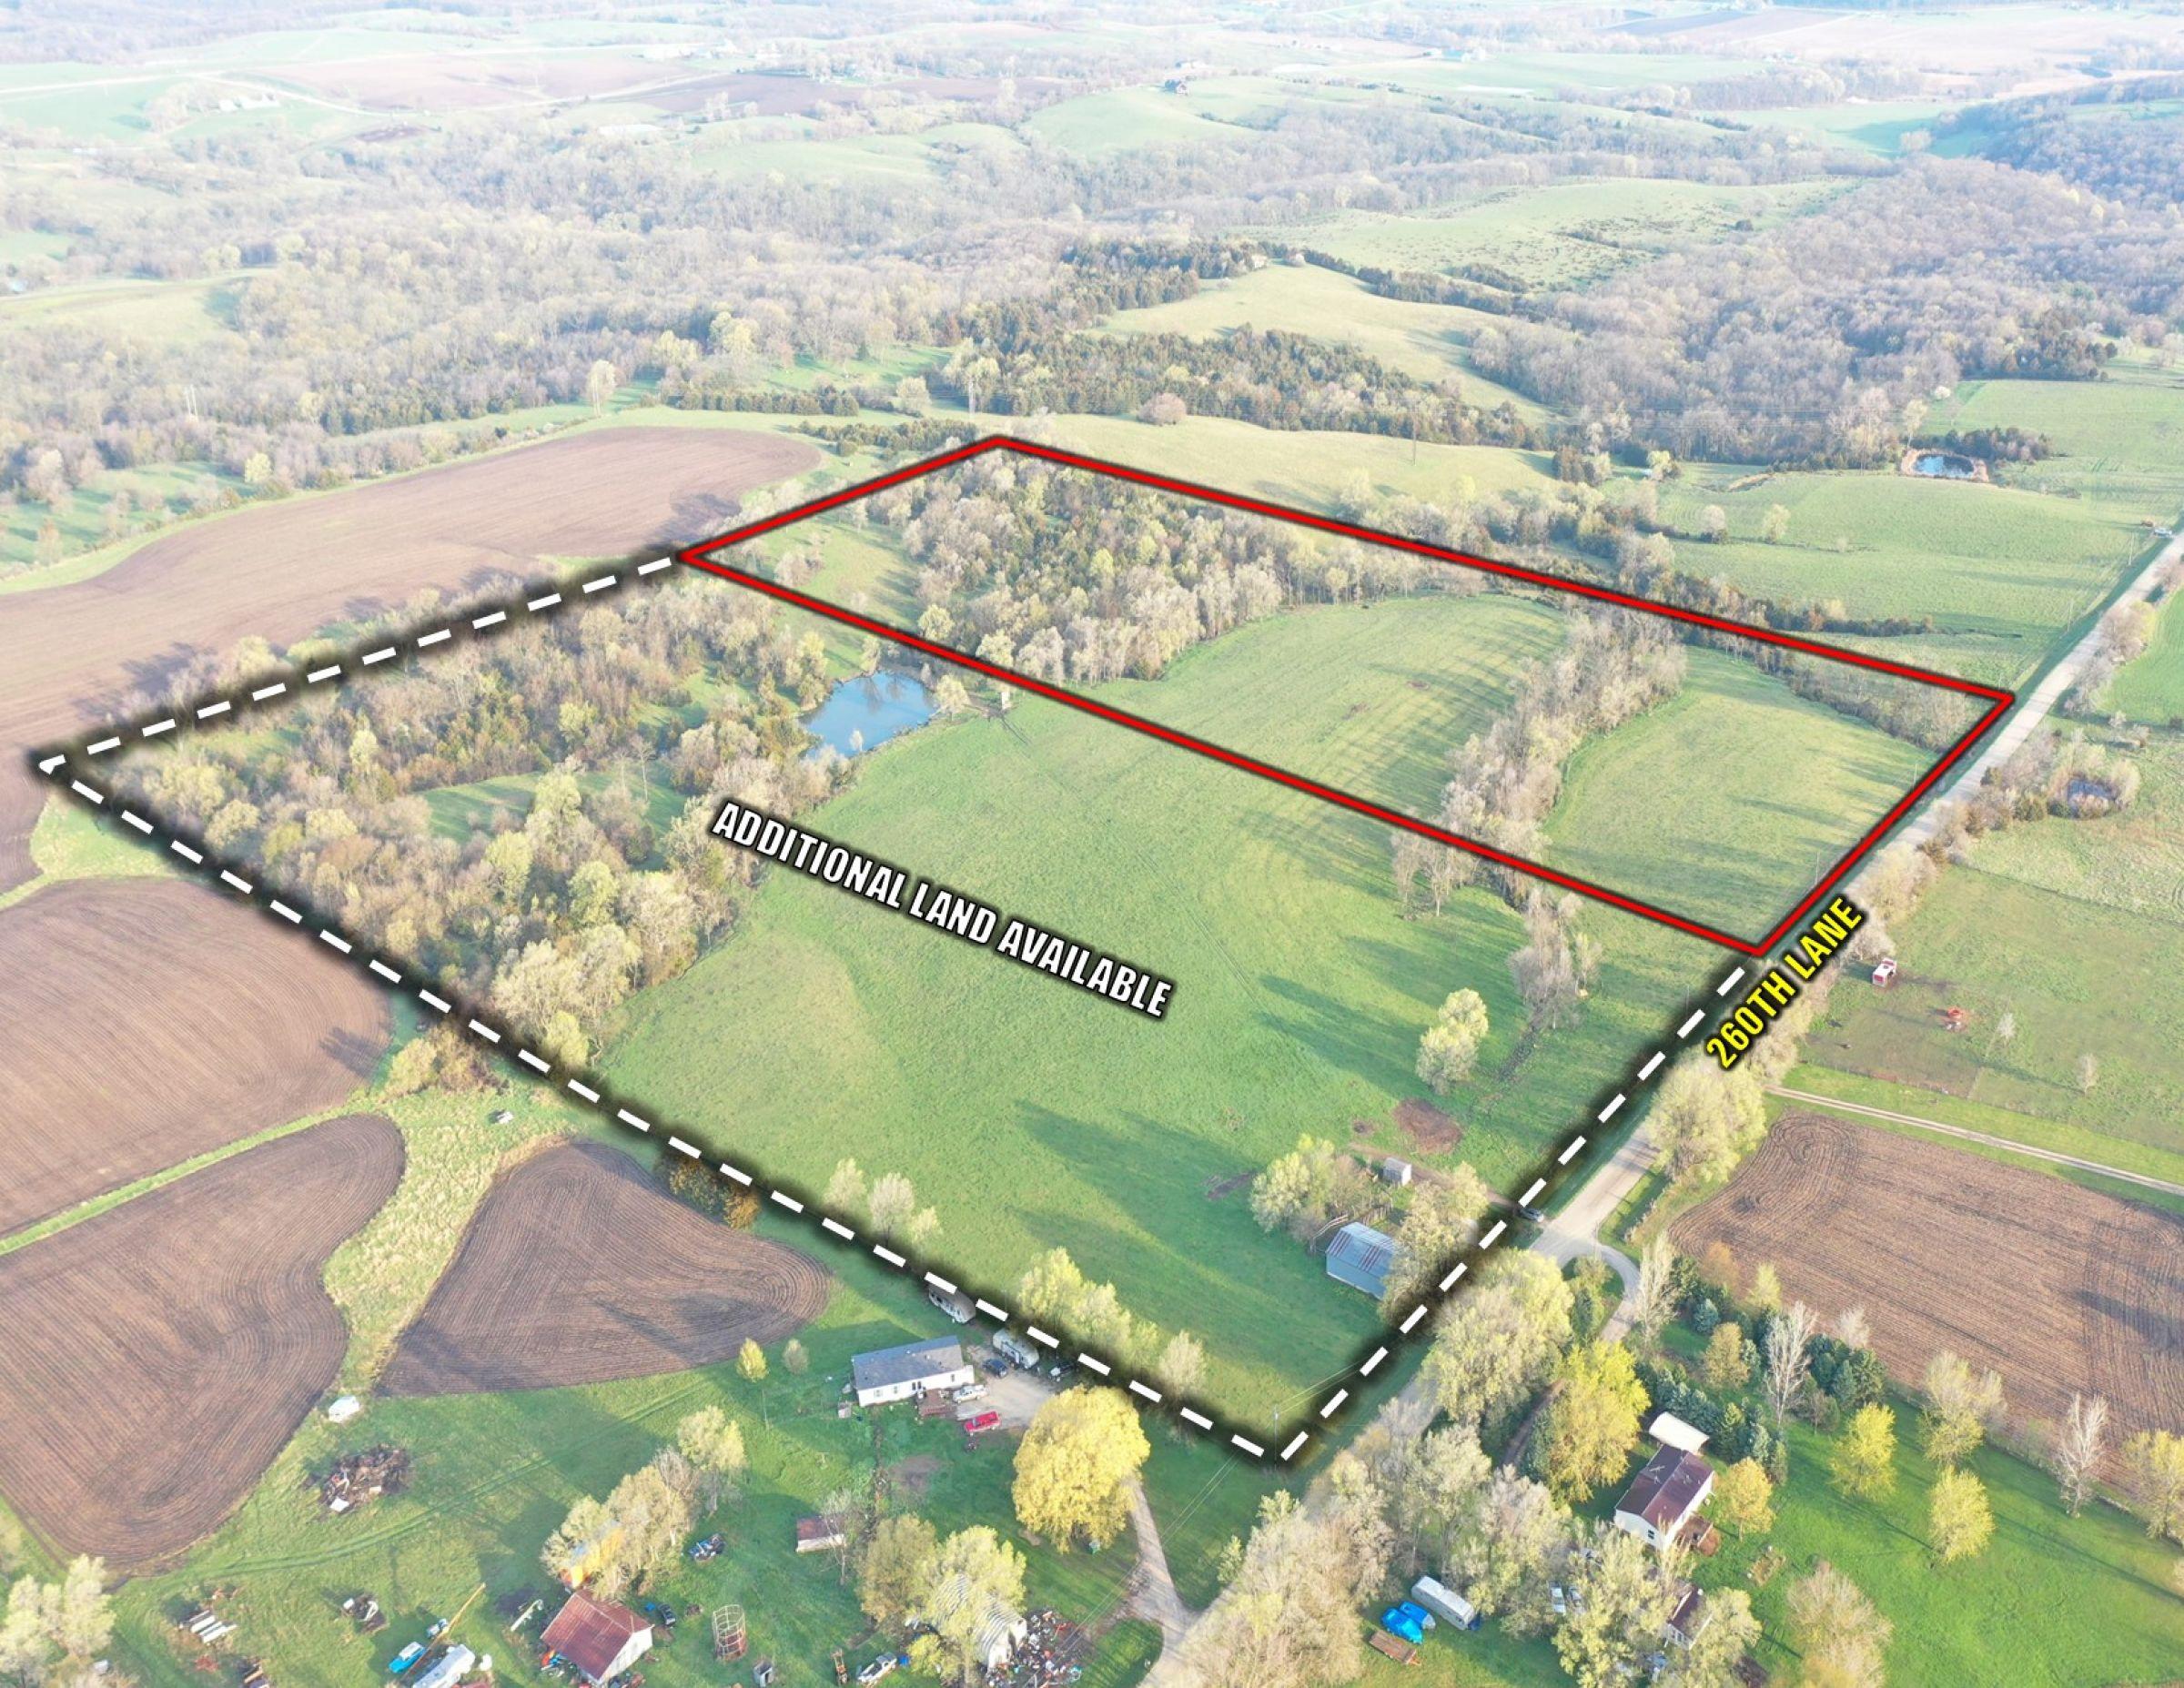 land-madison-county-iowa-20-acres-listing-number-15500-0-2021-05-05-035641.jpg